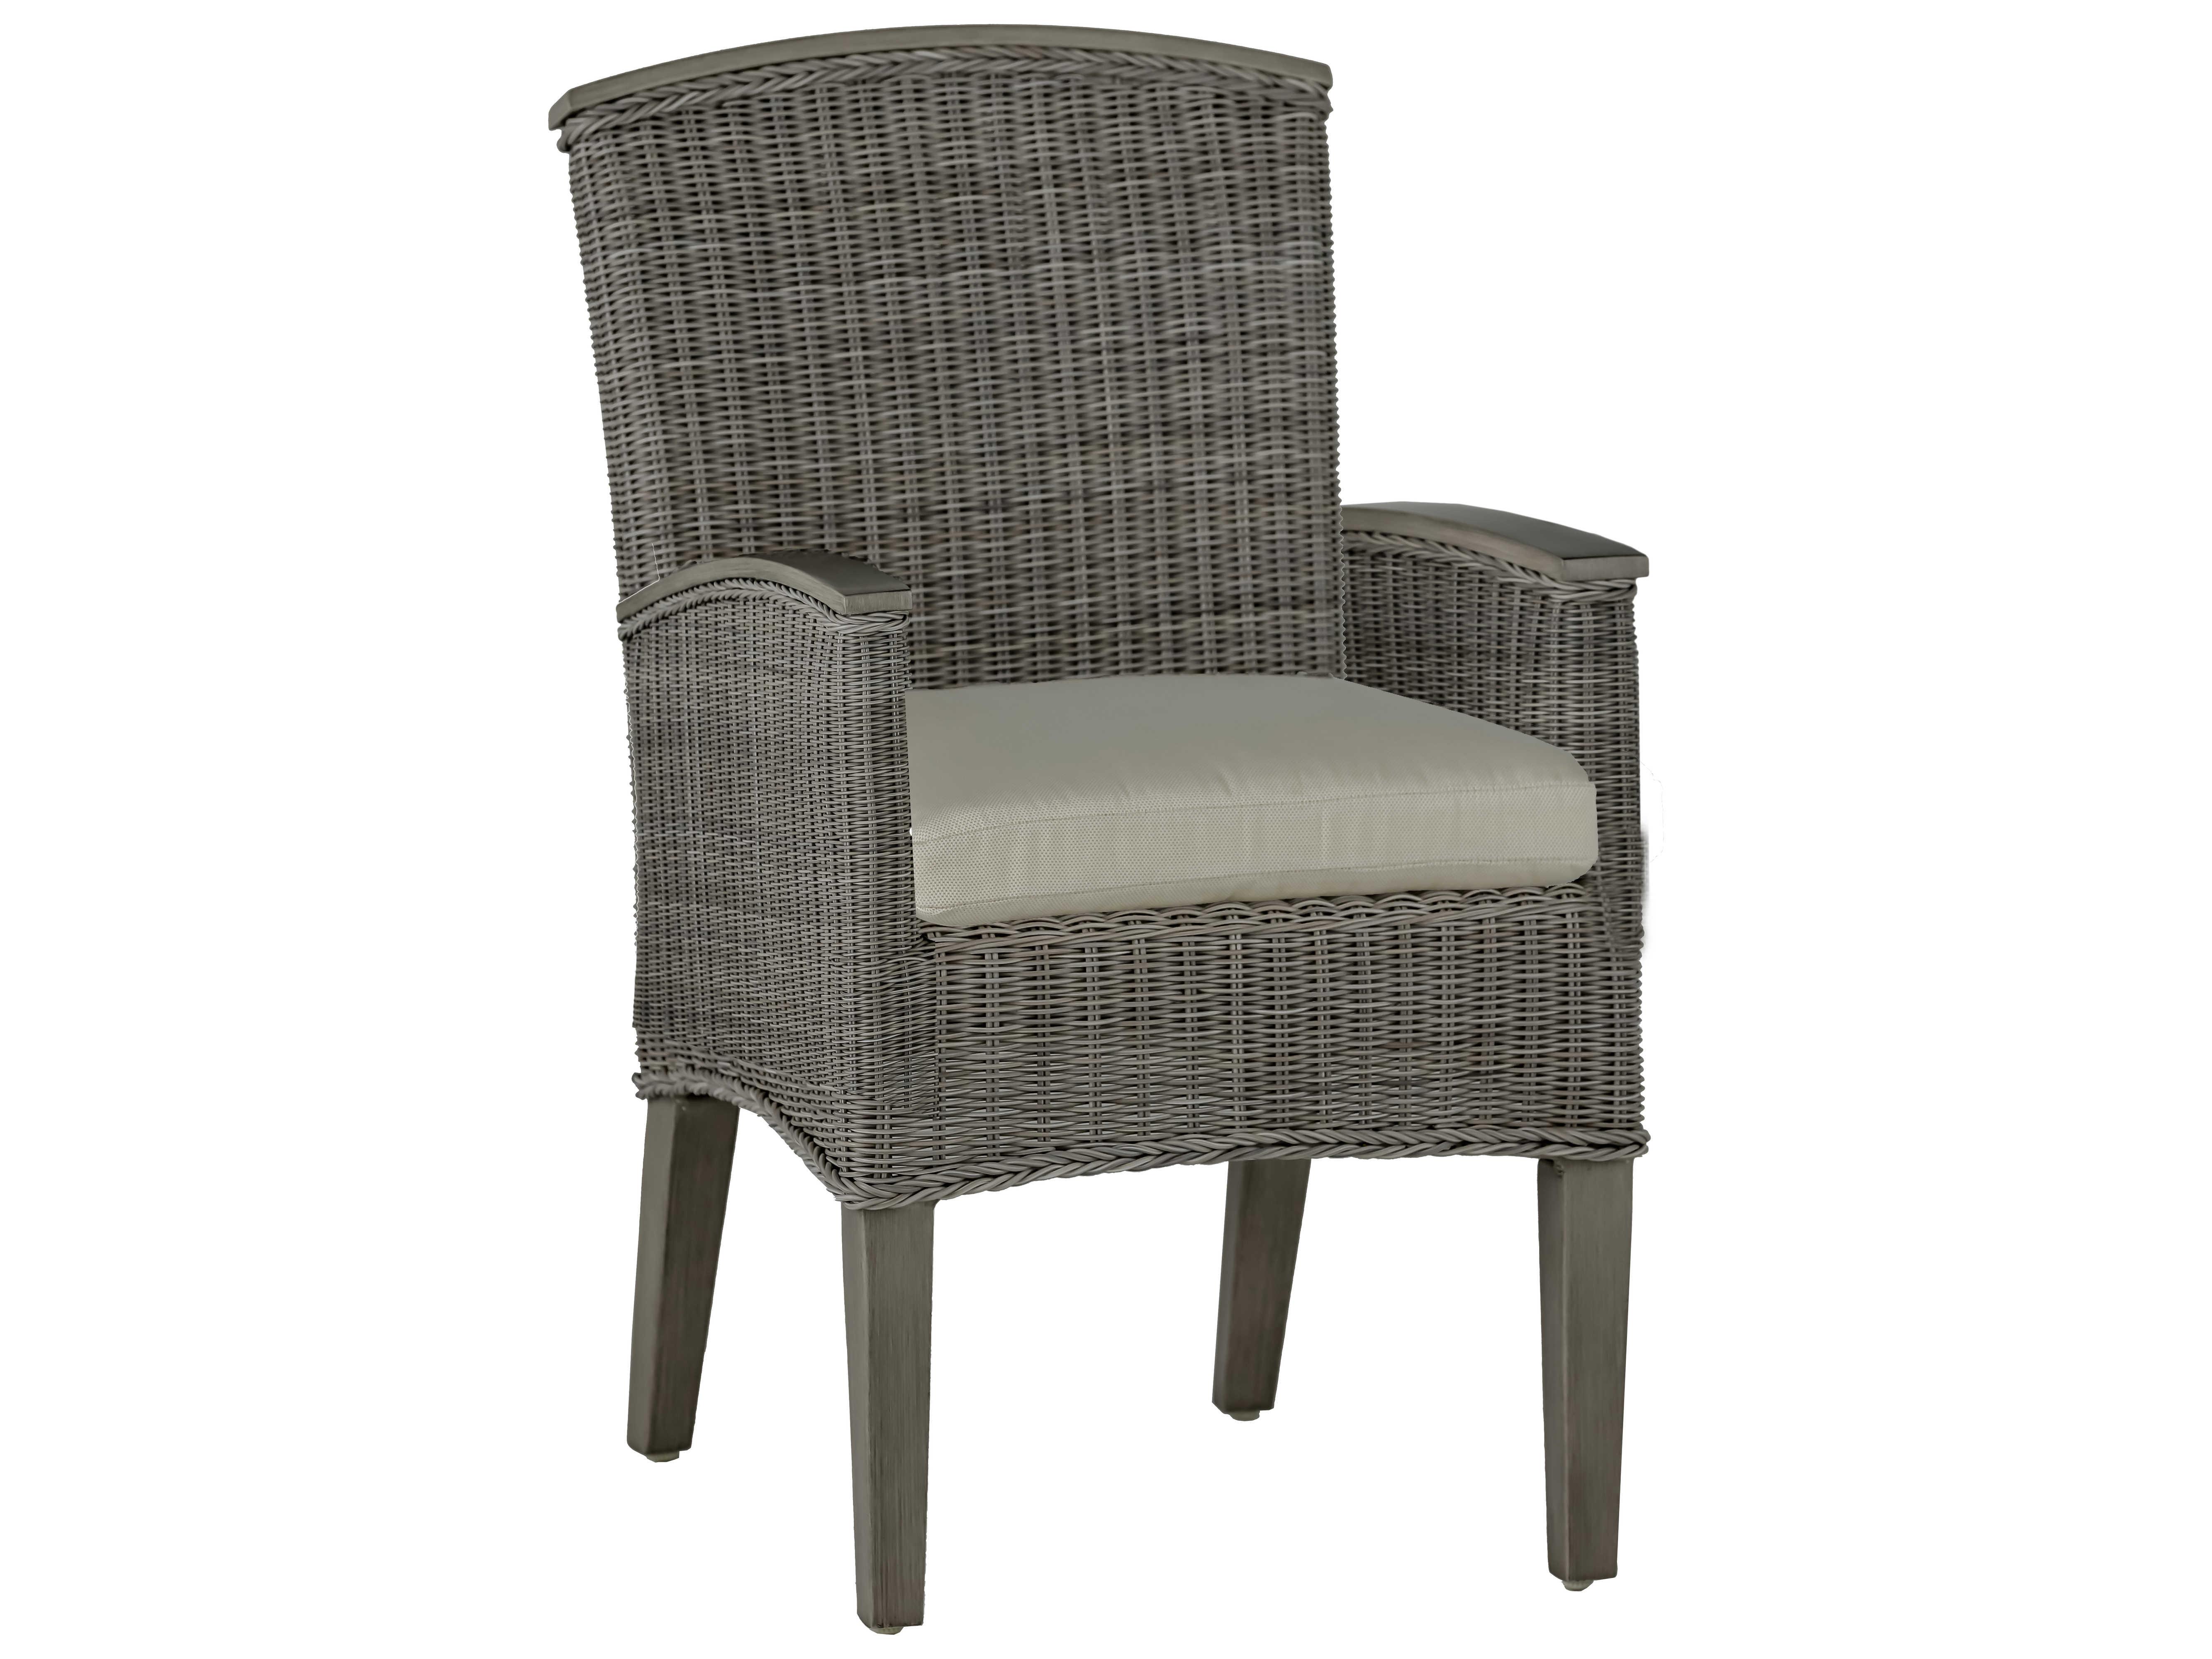 Summer Classics Astoria Wicker Oyster Dining Arm Chair ...